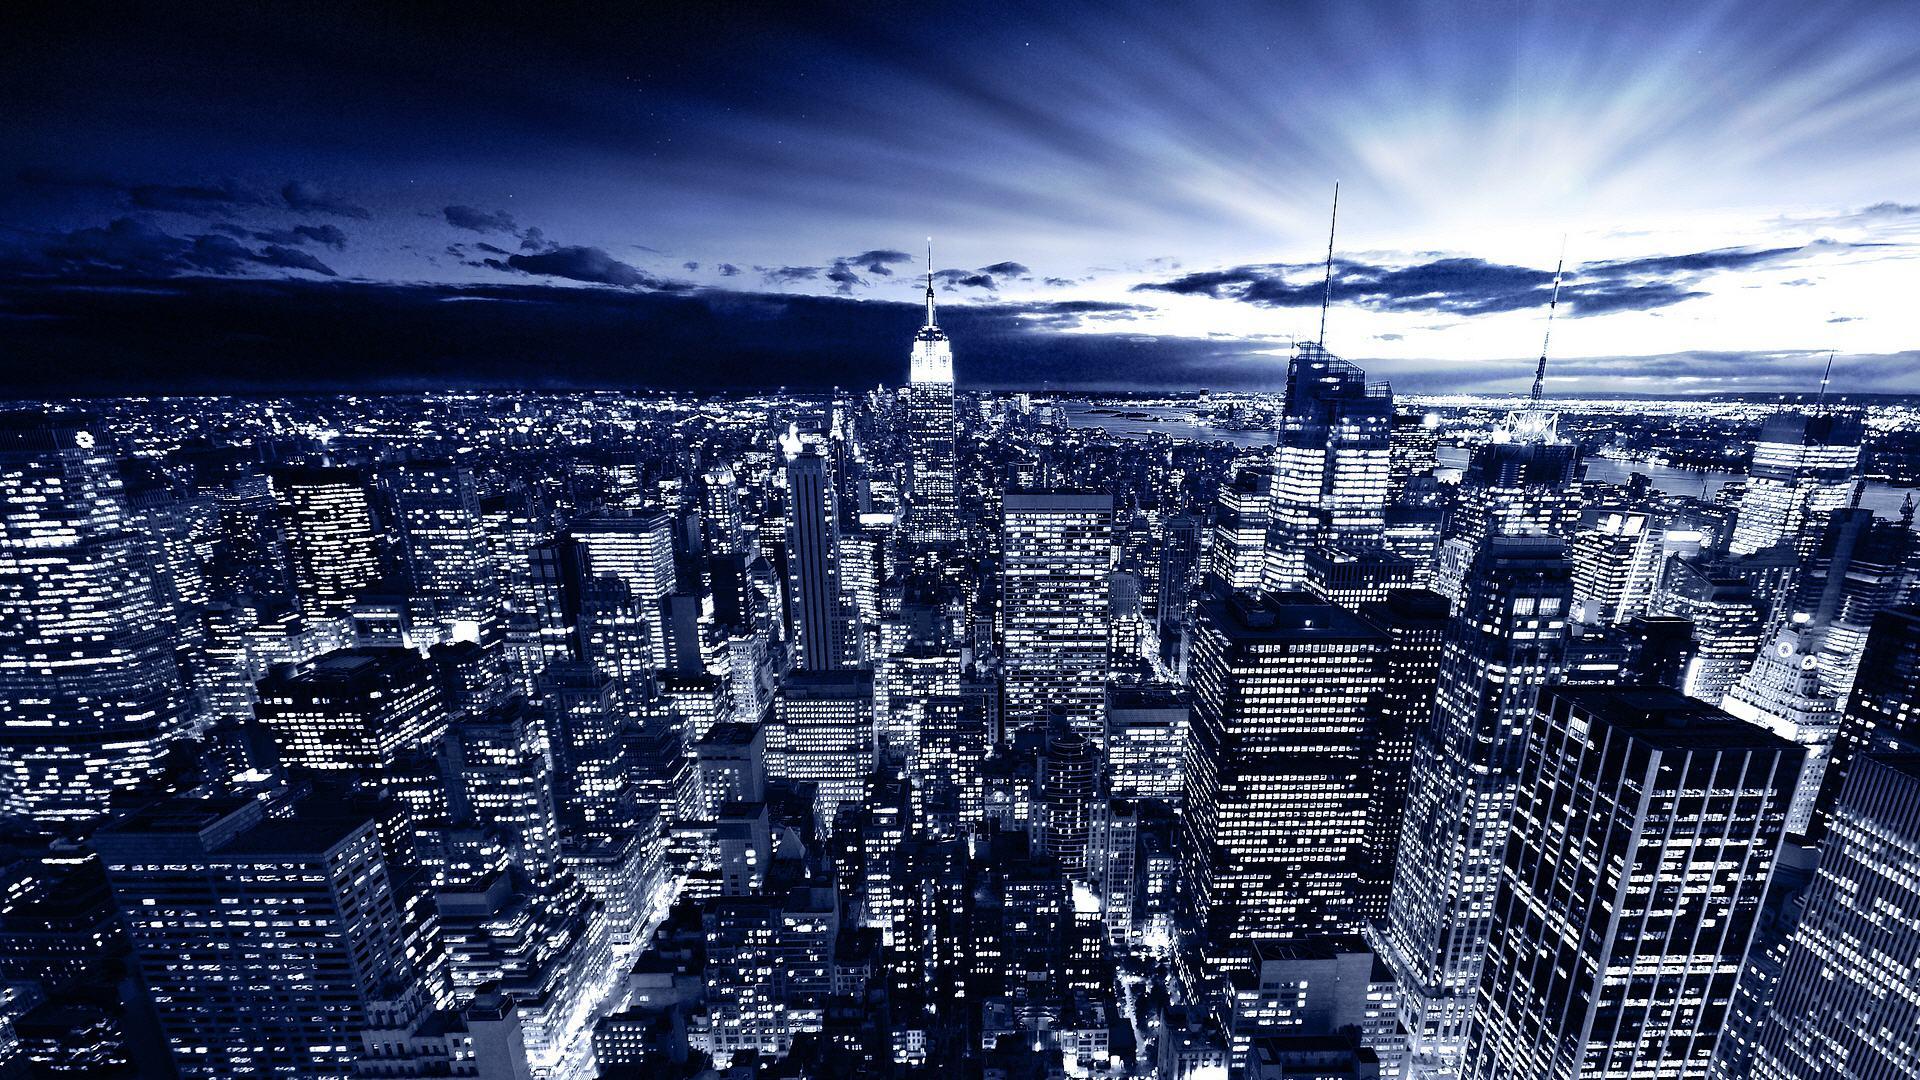 new-york-central-park-city-night-575058.jpg